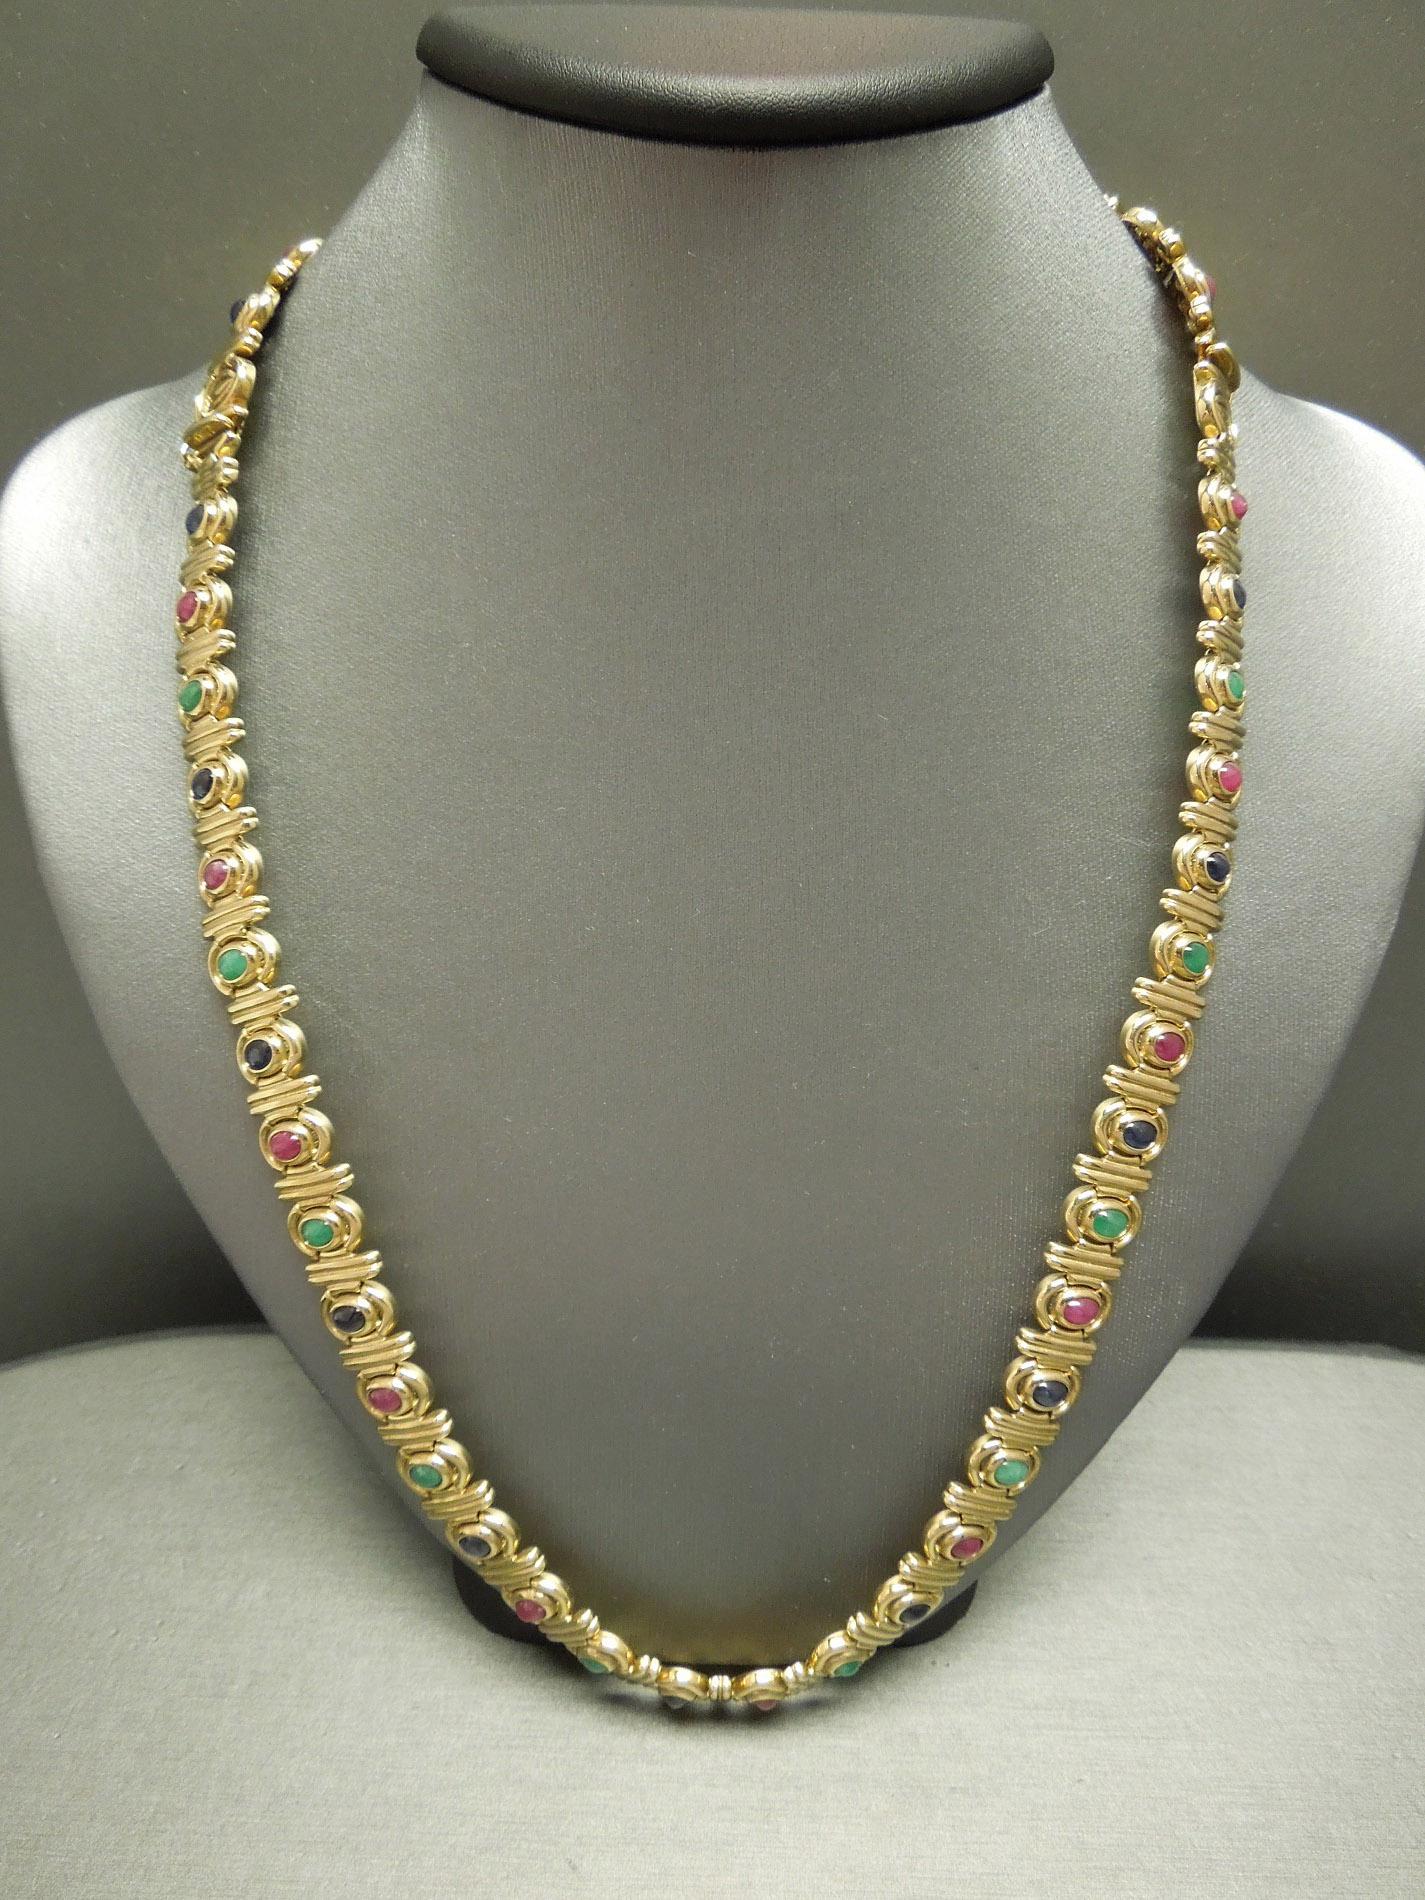 Egyptian Gold 19tcw Precious Gemstone Necklace Amp Bracelet Set